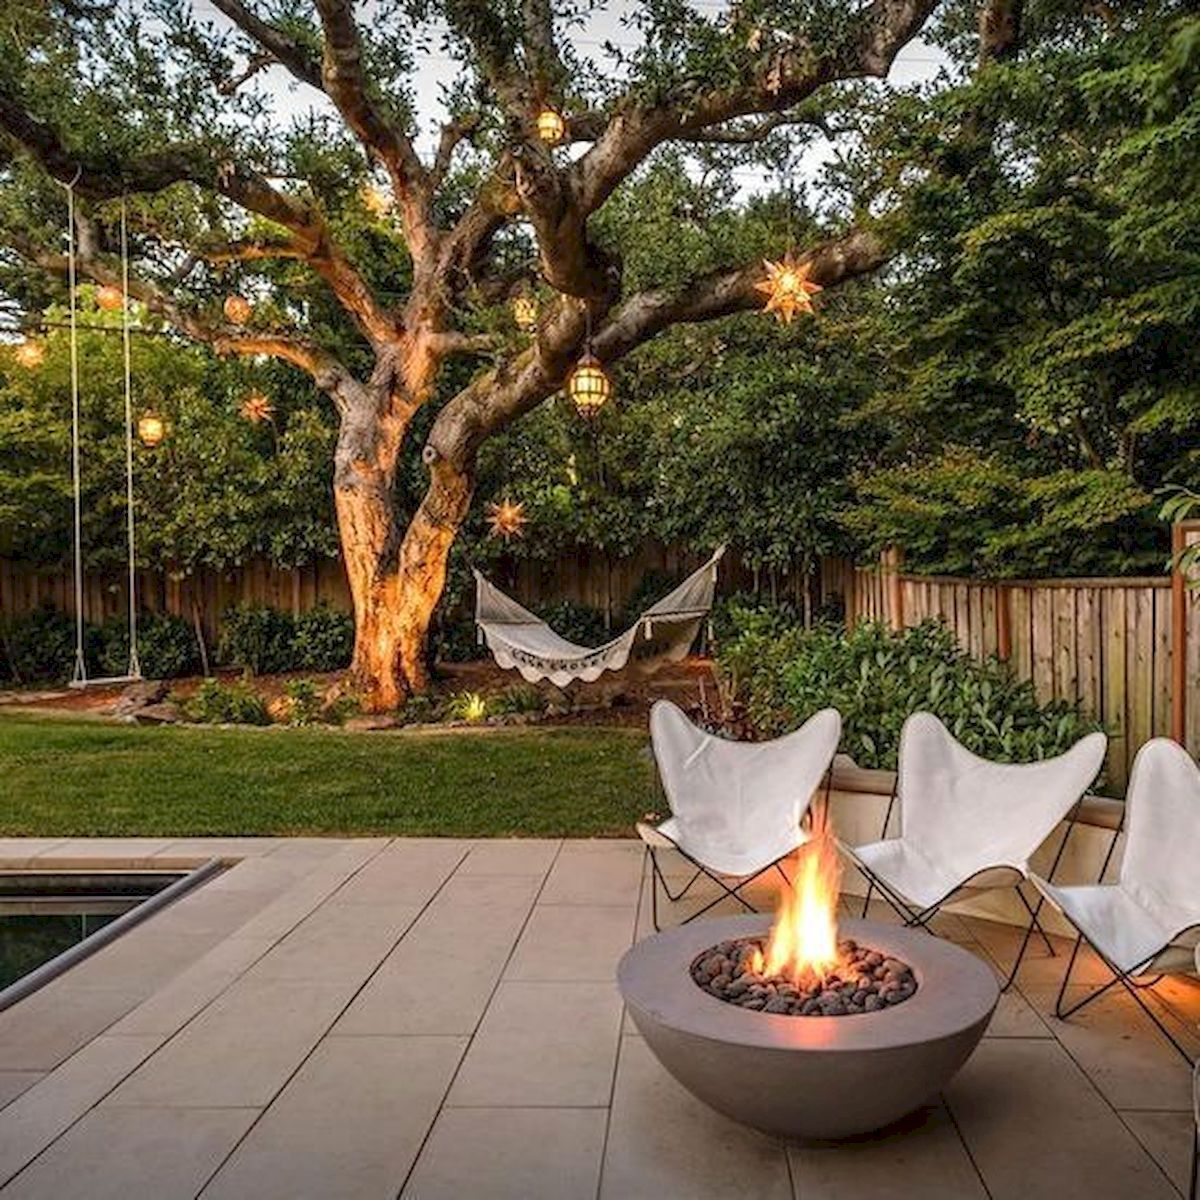 60 Beautiful Backyard Garden Design Ideas And Remodel #gardendesignideas